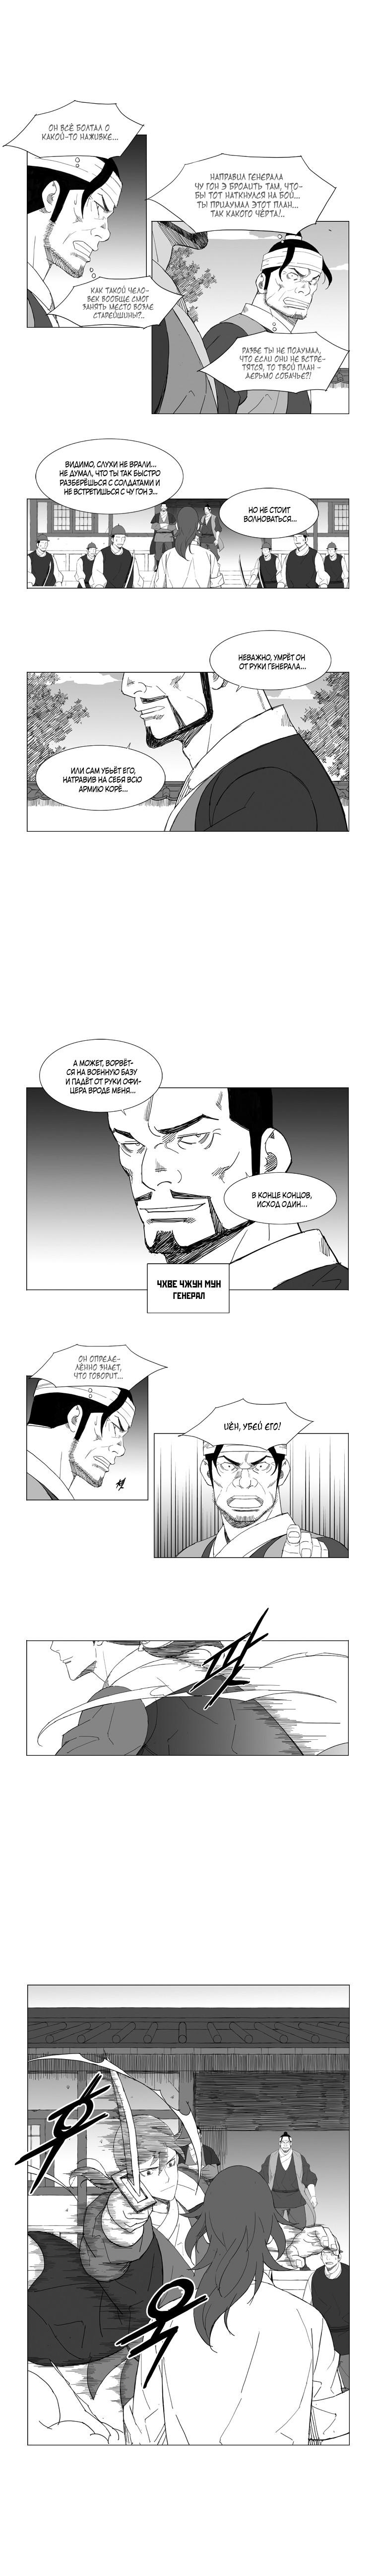 https://r1.ninemanga.com/comics/pic2/39/28263/336515/1509639295463.jpg Page 5